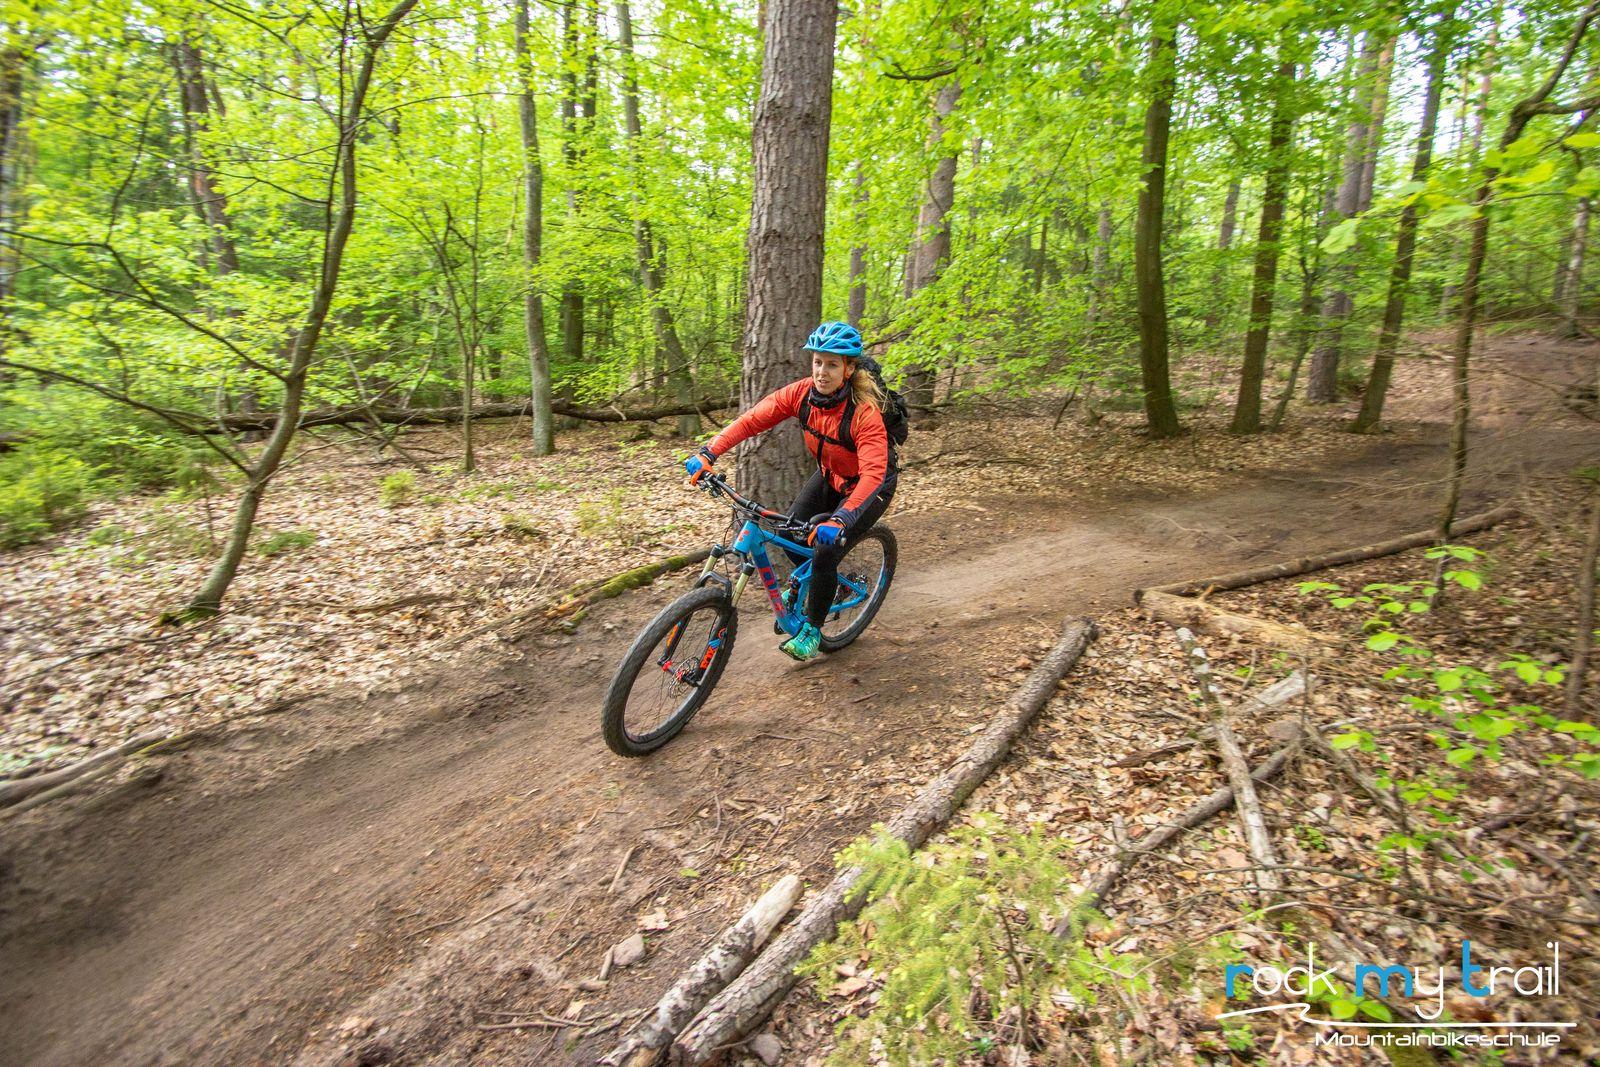 MTB Fahrtechnik Kurs Fortgeschrittene in Nürnberg - Rock my Trail Bikeschule